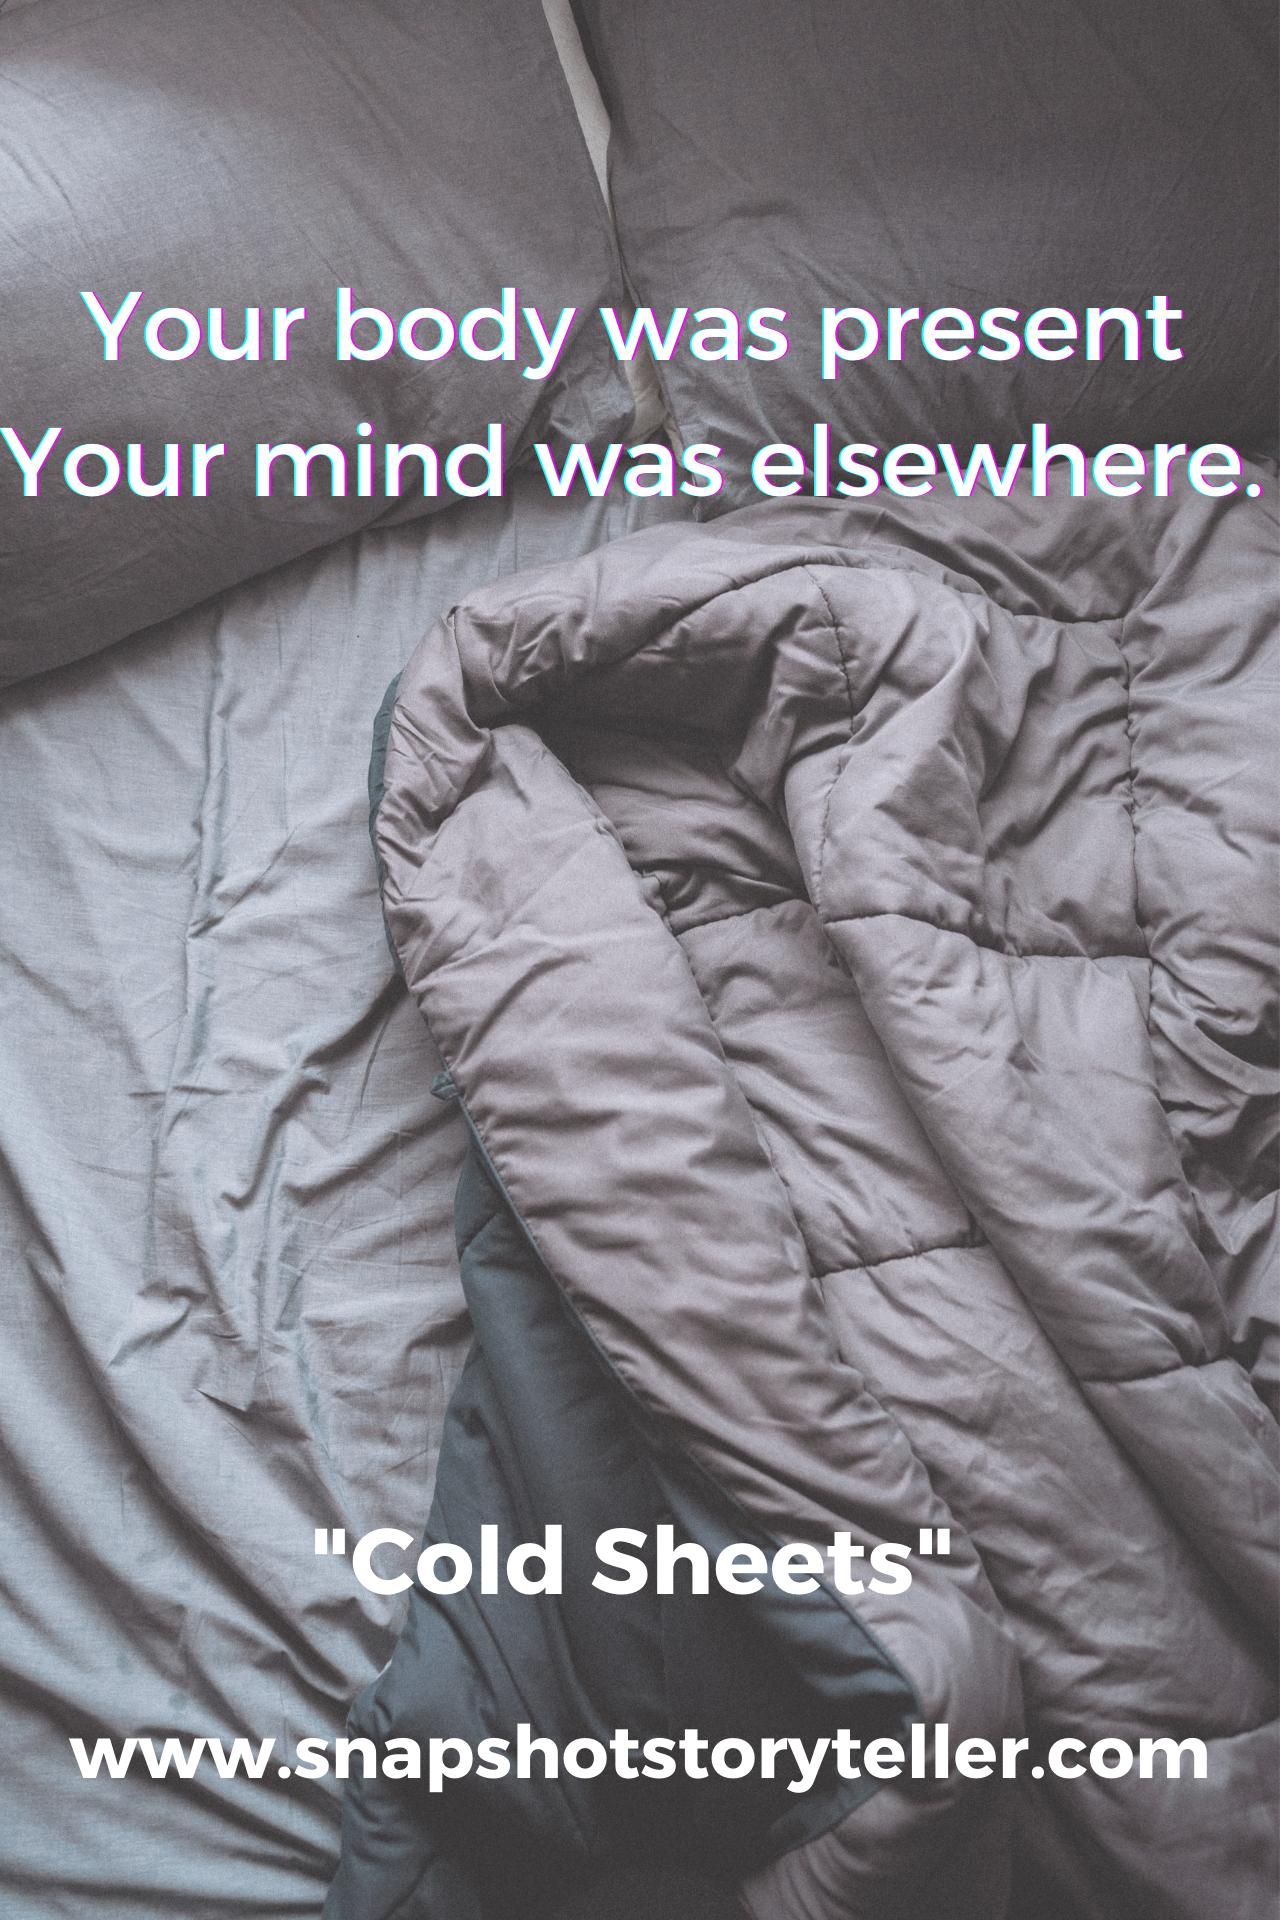 Snapshot Storyteller   Cold Sheets   www.snapshotstoryteller.com   #amwriting #SnapshotStoryteller #creativestoryteller #creative #storyteller #creativewriter #IWrite #WriteOn #writersofinstagram